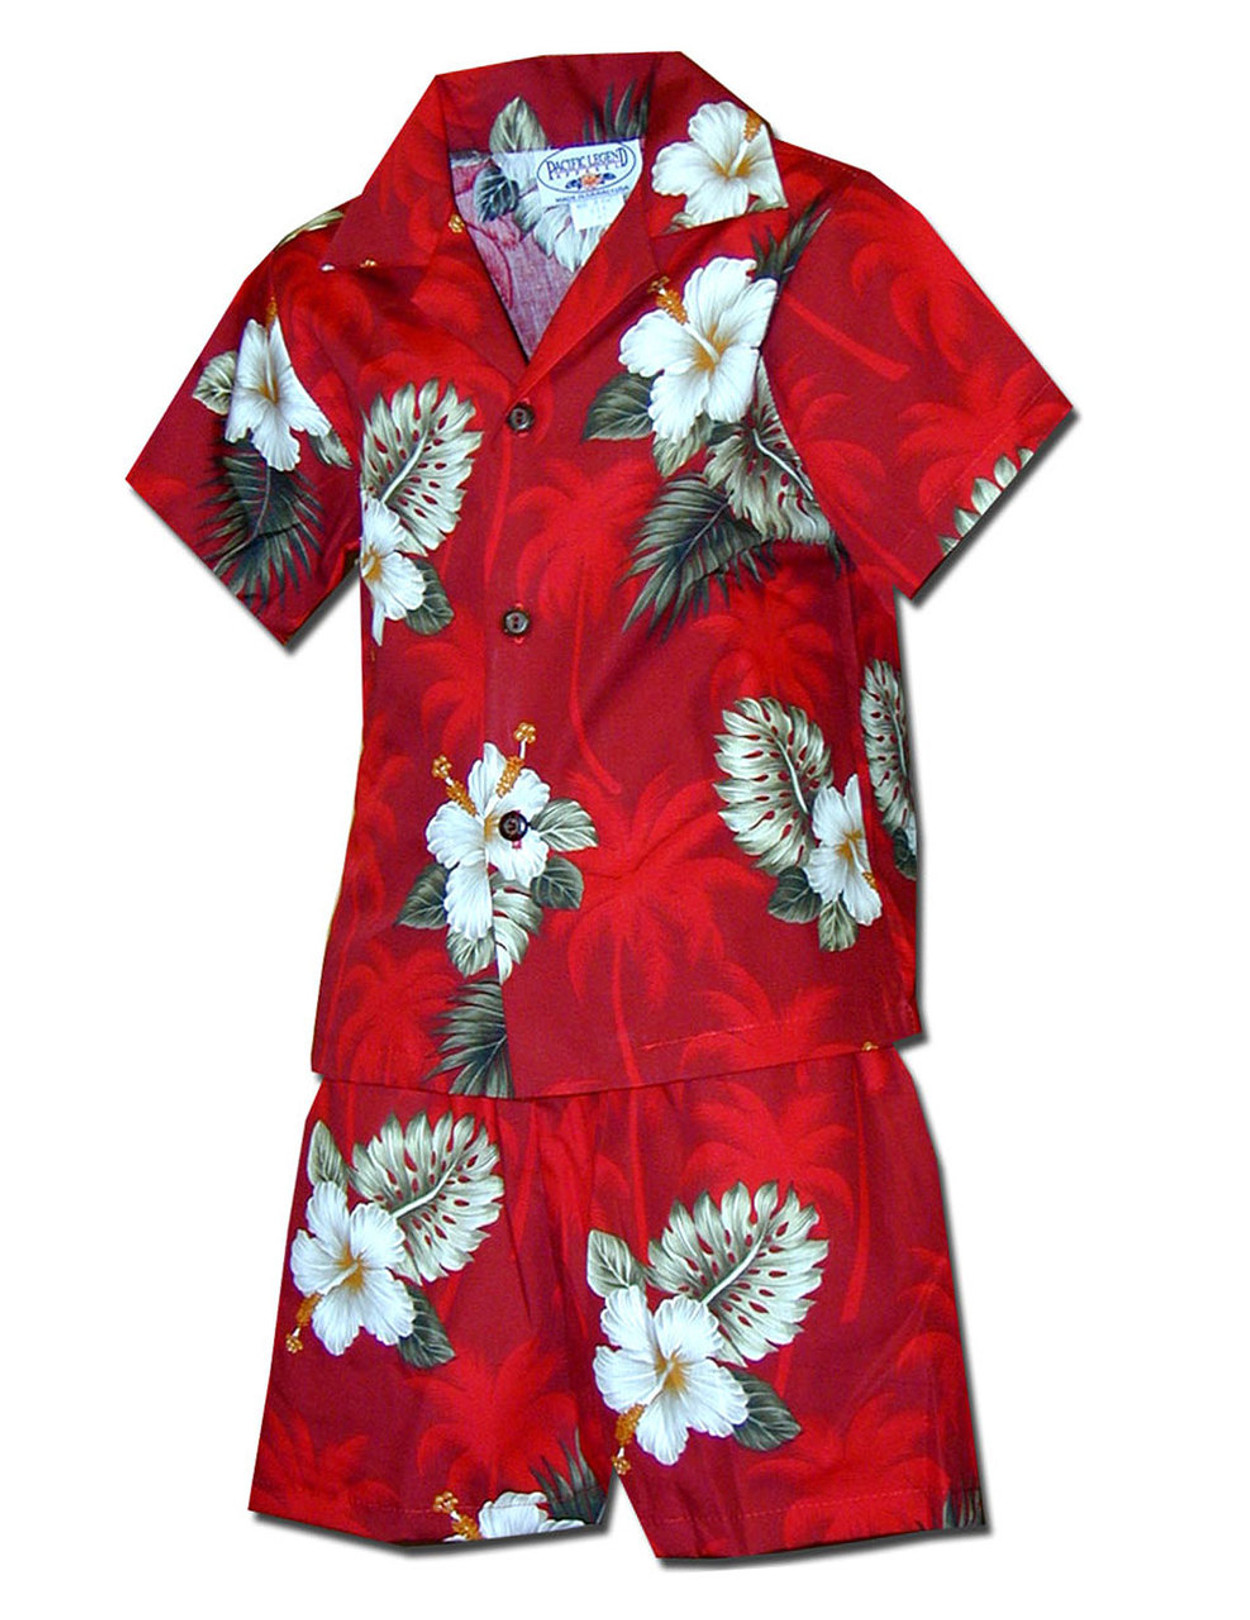 45be2e836215 Toddler Boys Clothes Set Island Ka Pua 100% Cotton Fabric Matching Shorts  and Shirt Set